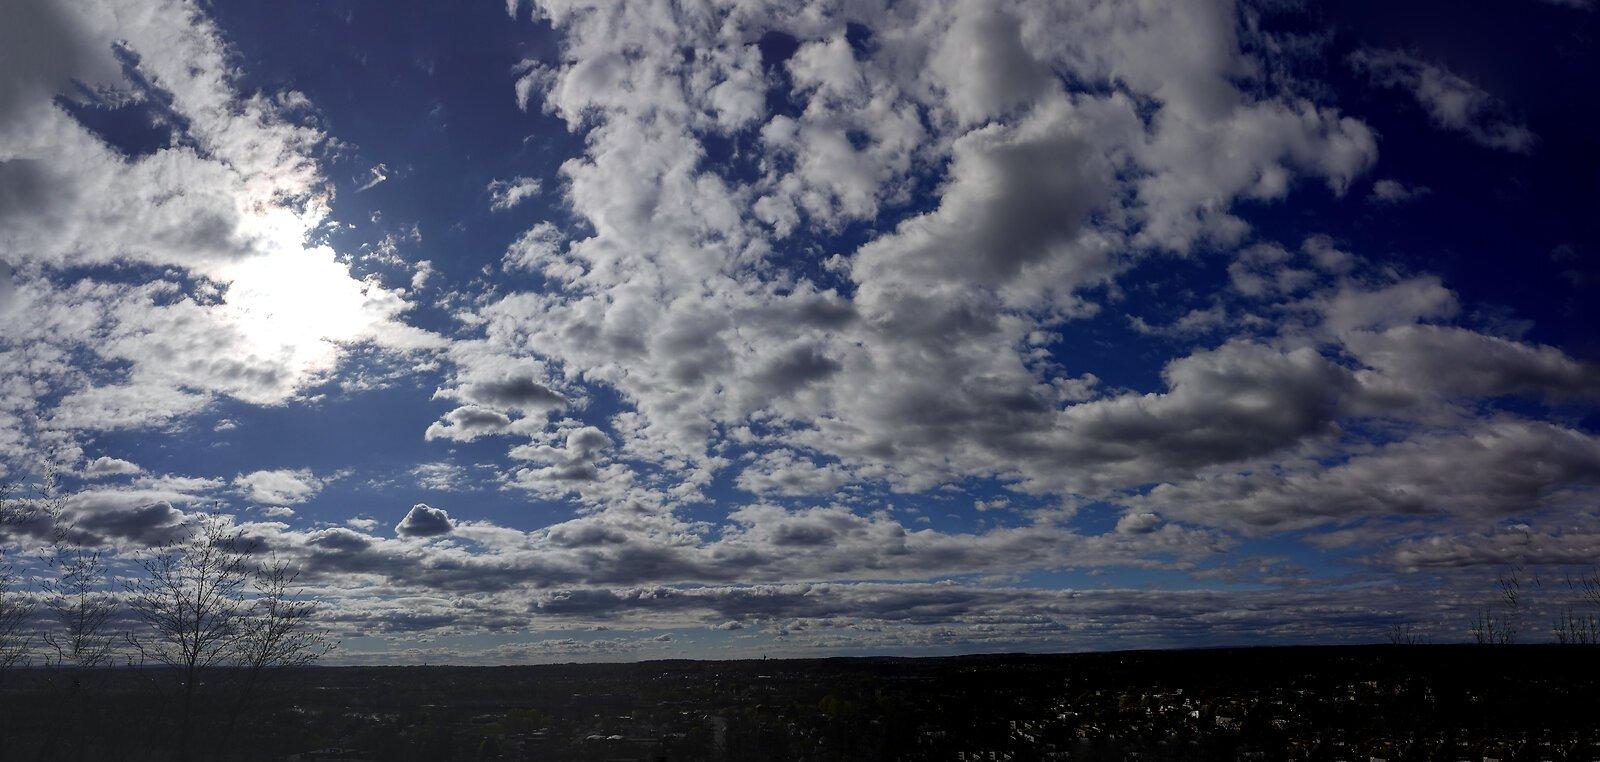 RX10 Oakwood cloud factory 041_stitch_DxO.jpg